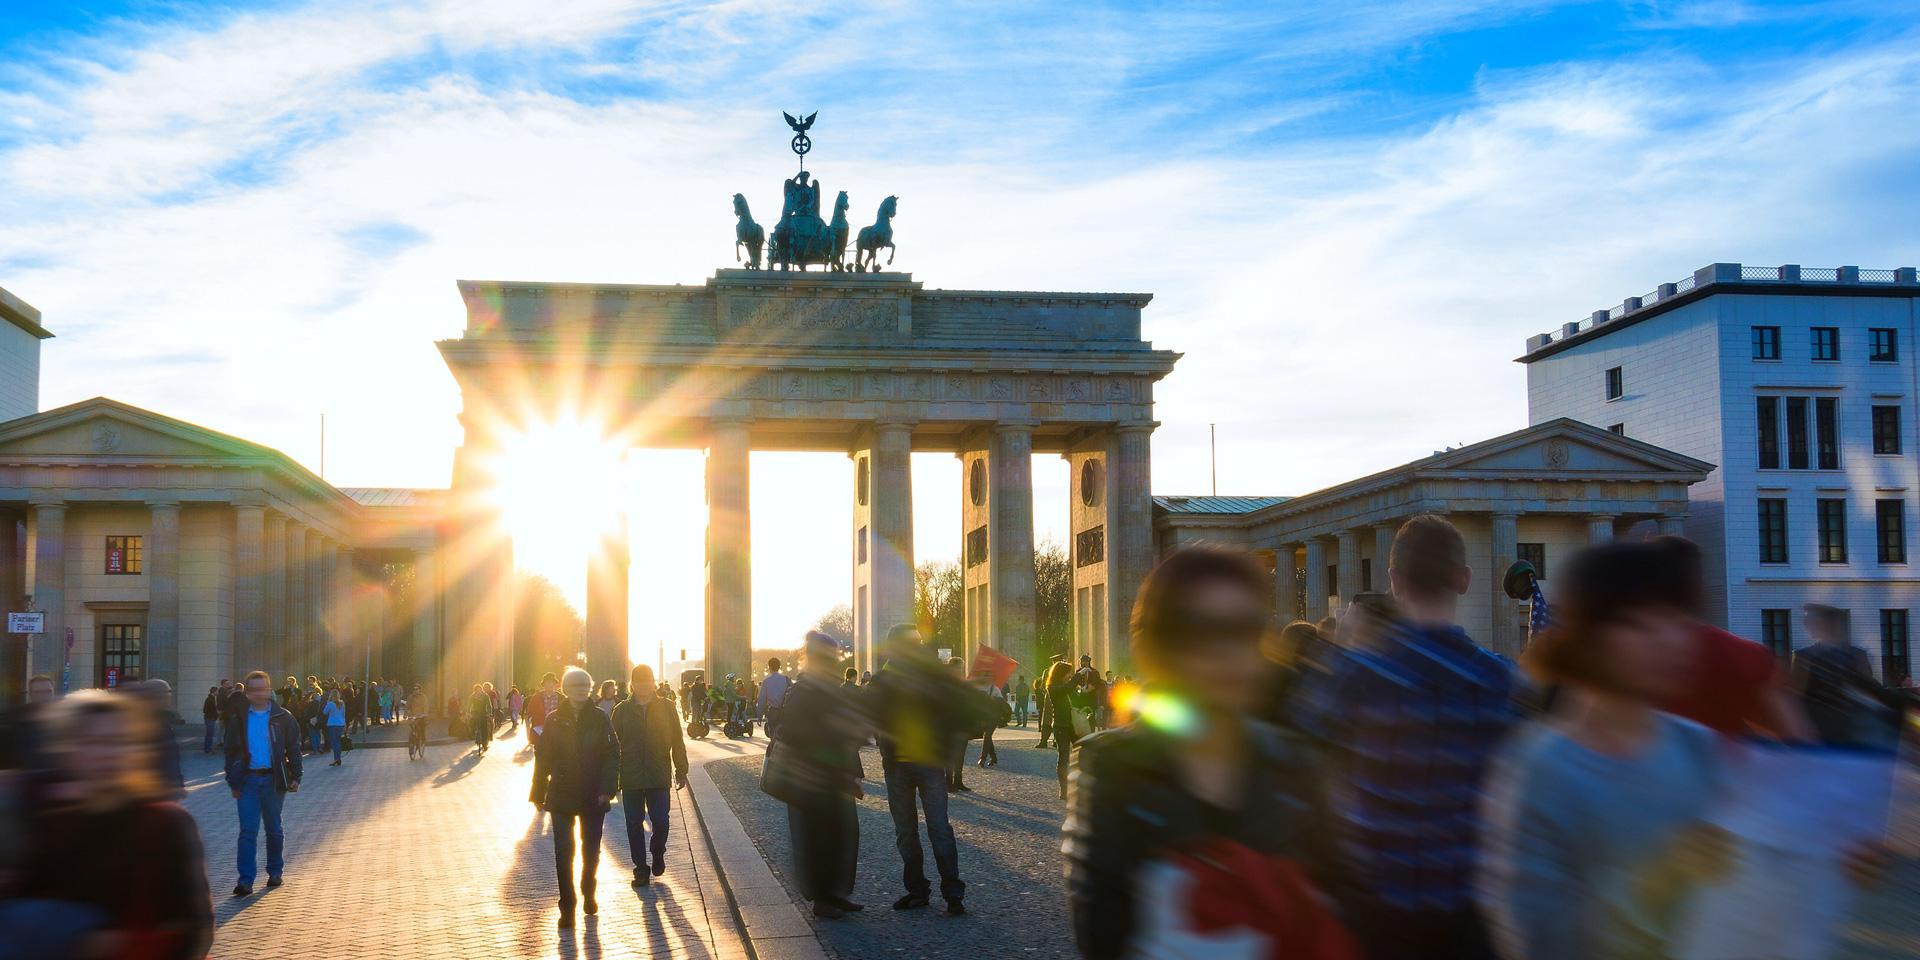 berlin flyinger © fotolia.com